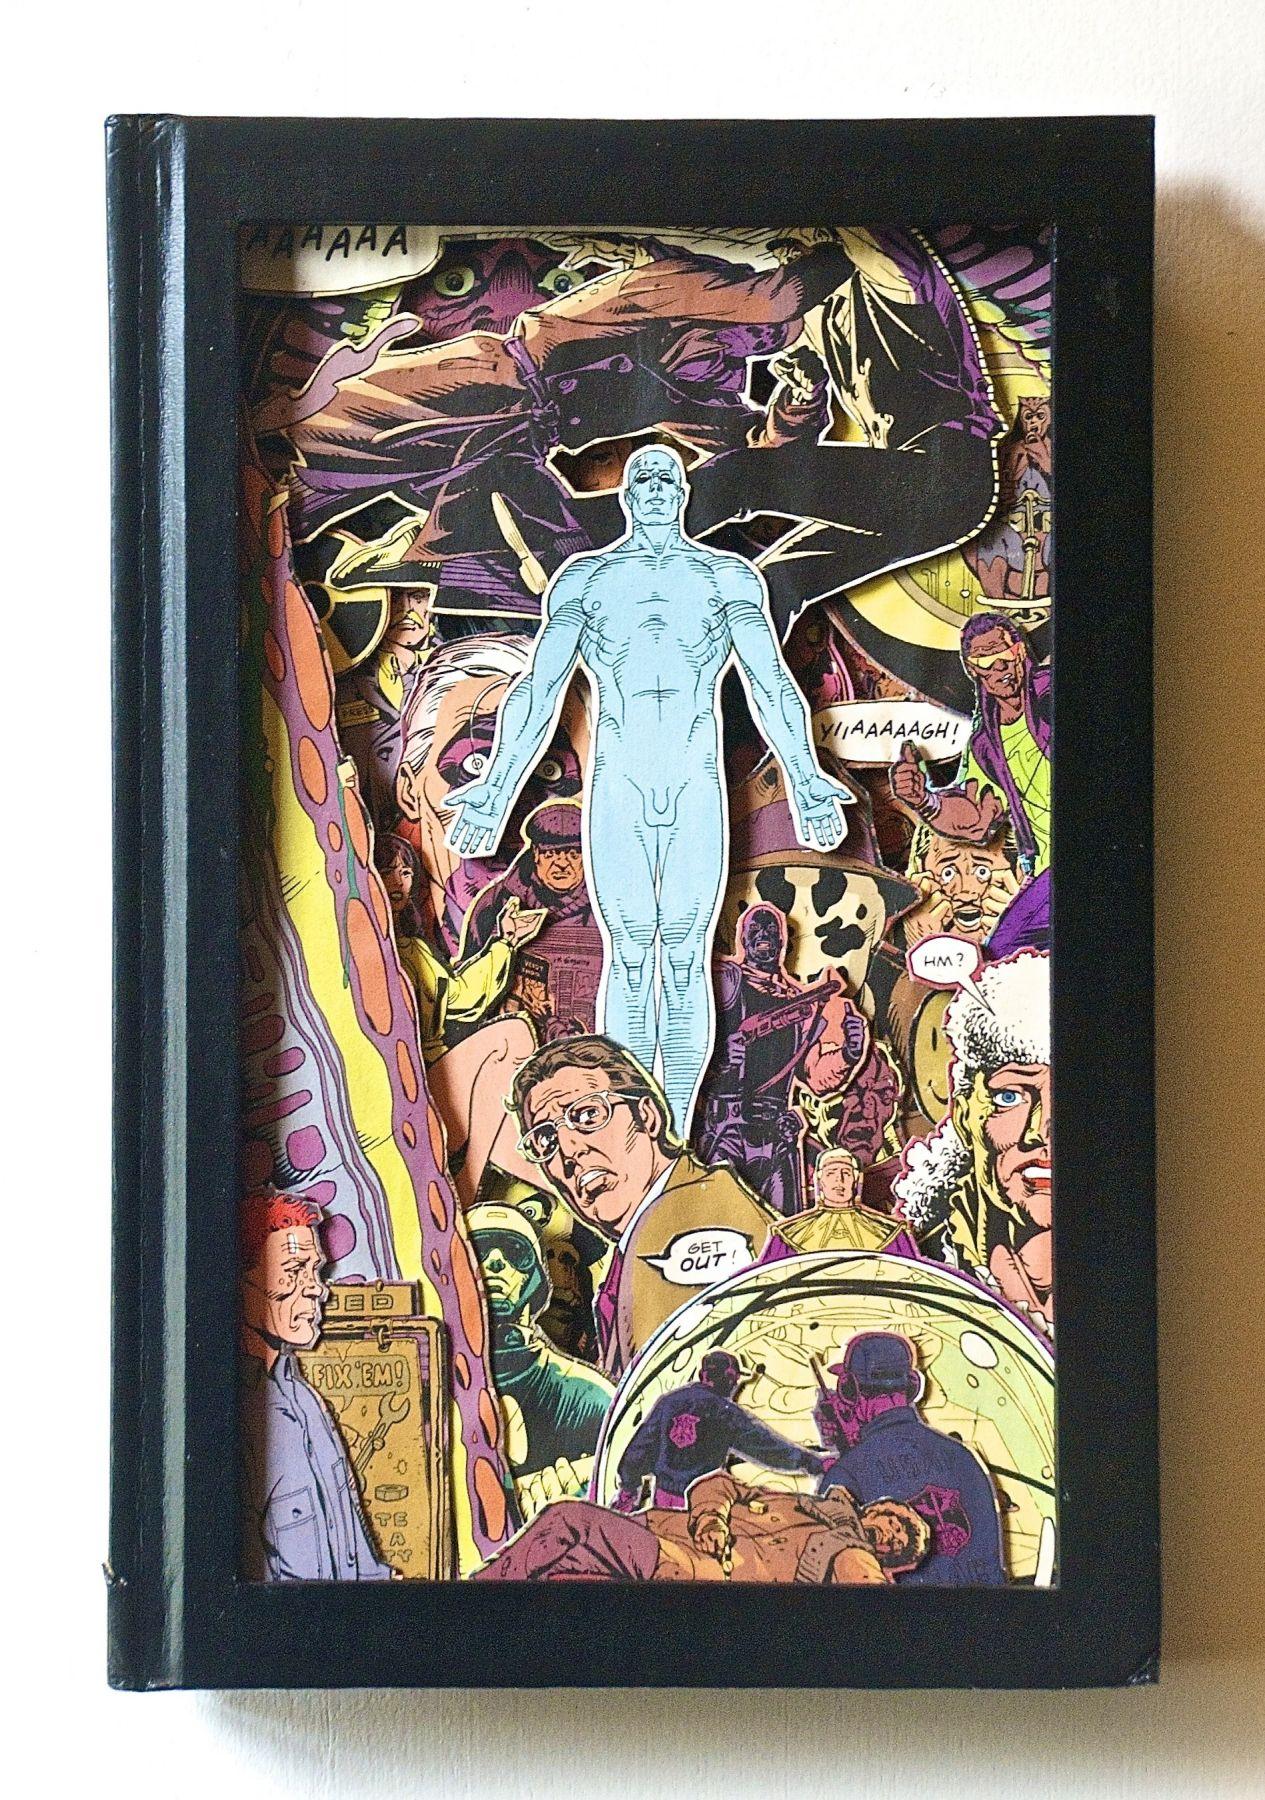 TONY DAGRADI, Ascension - Watchmen, 2018